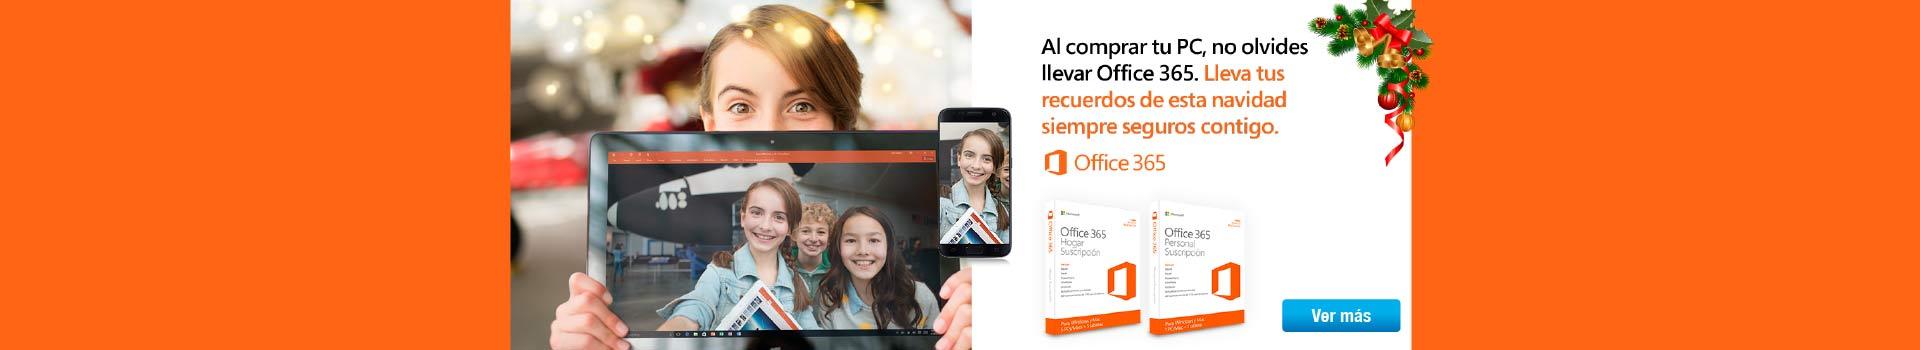 Pauta Microsoft - Categoría PC y Tablets - diciembre 1 - One Drive Microsoft